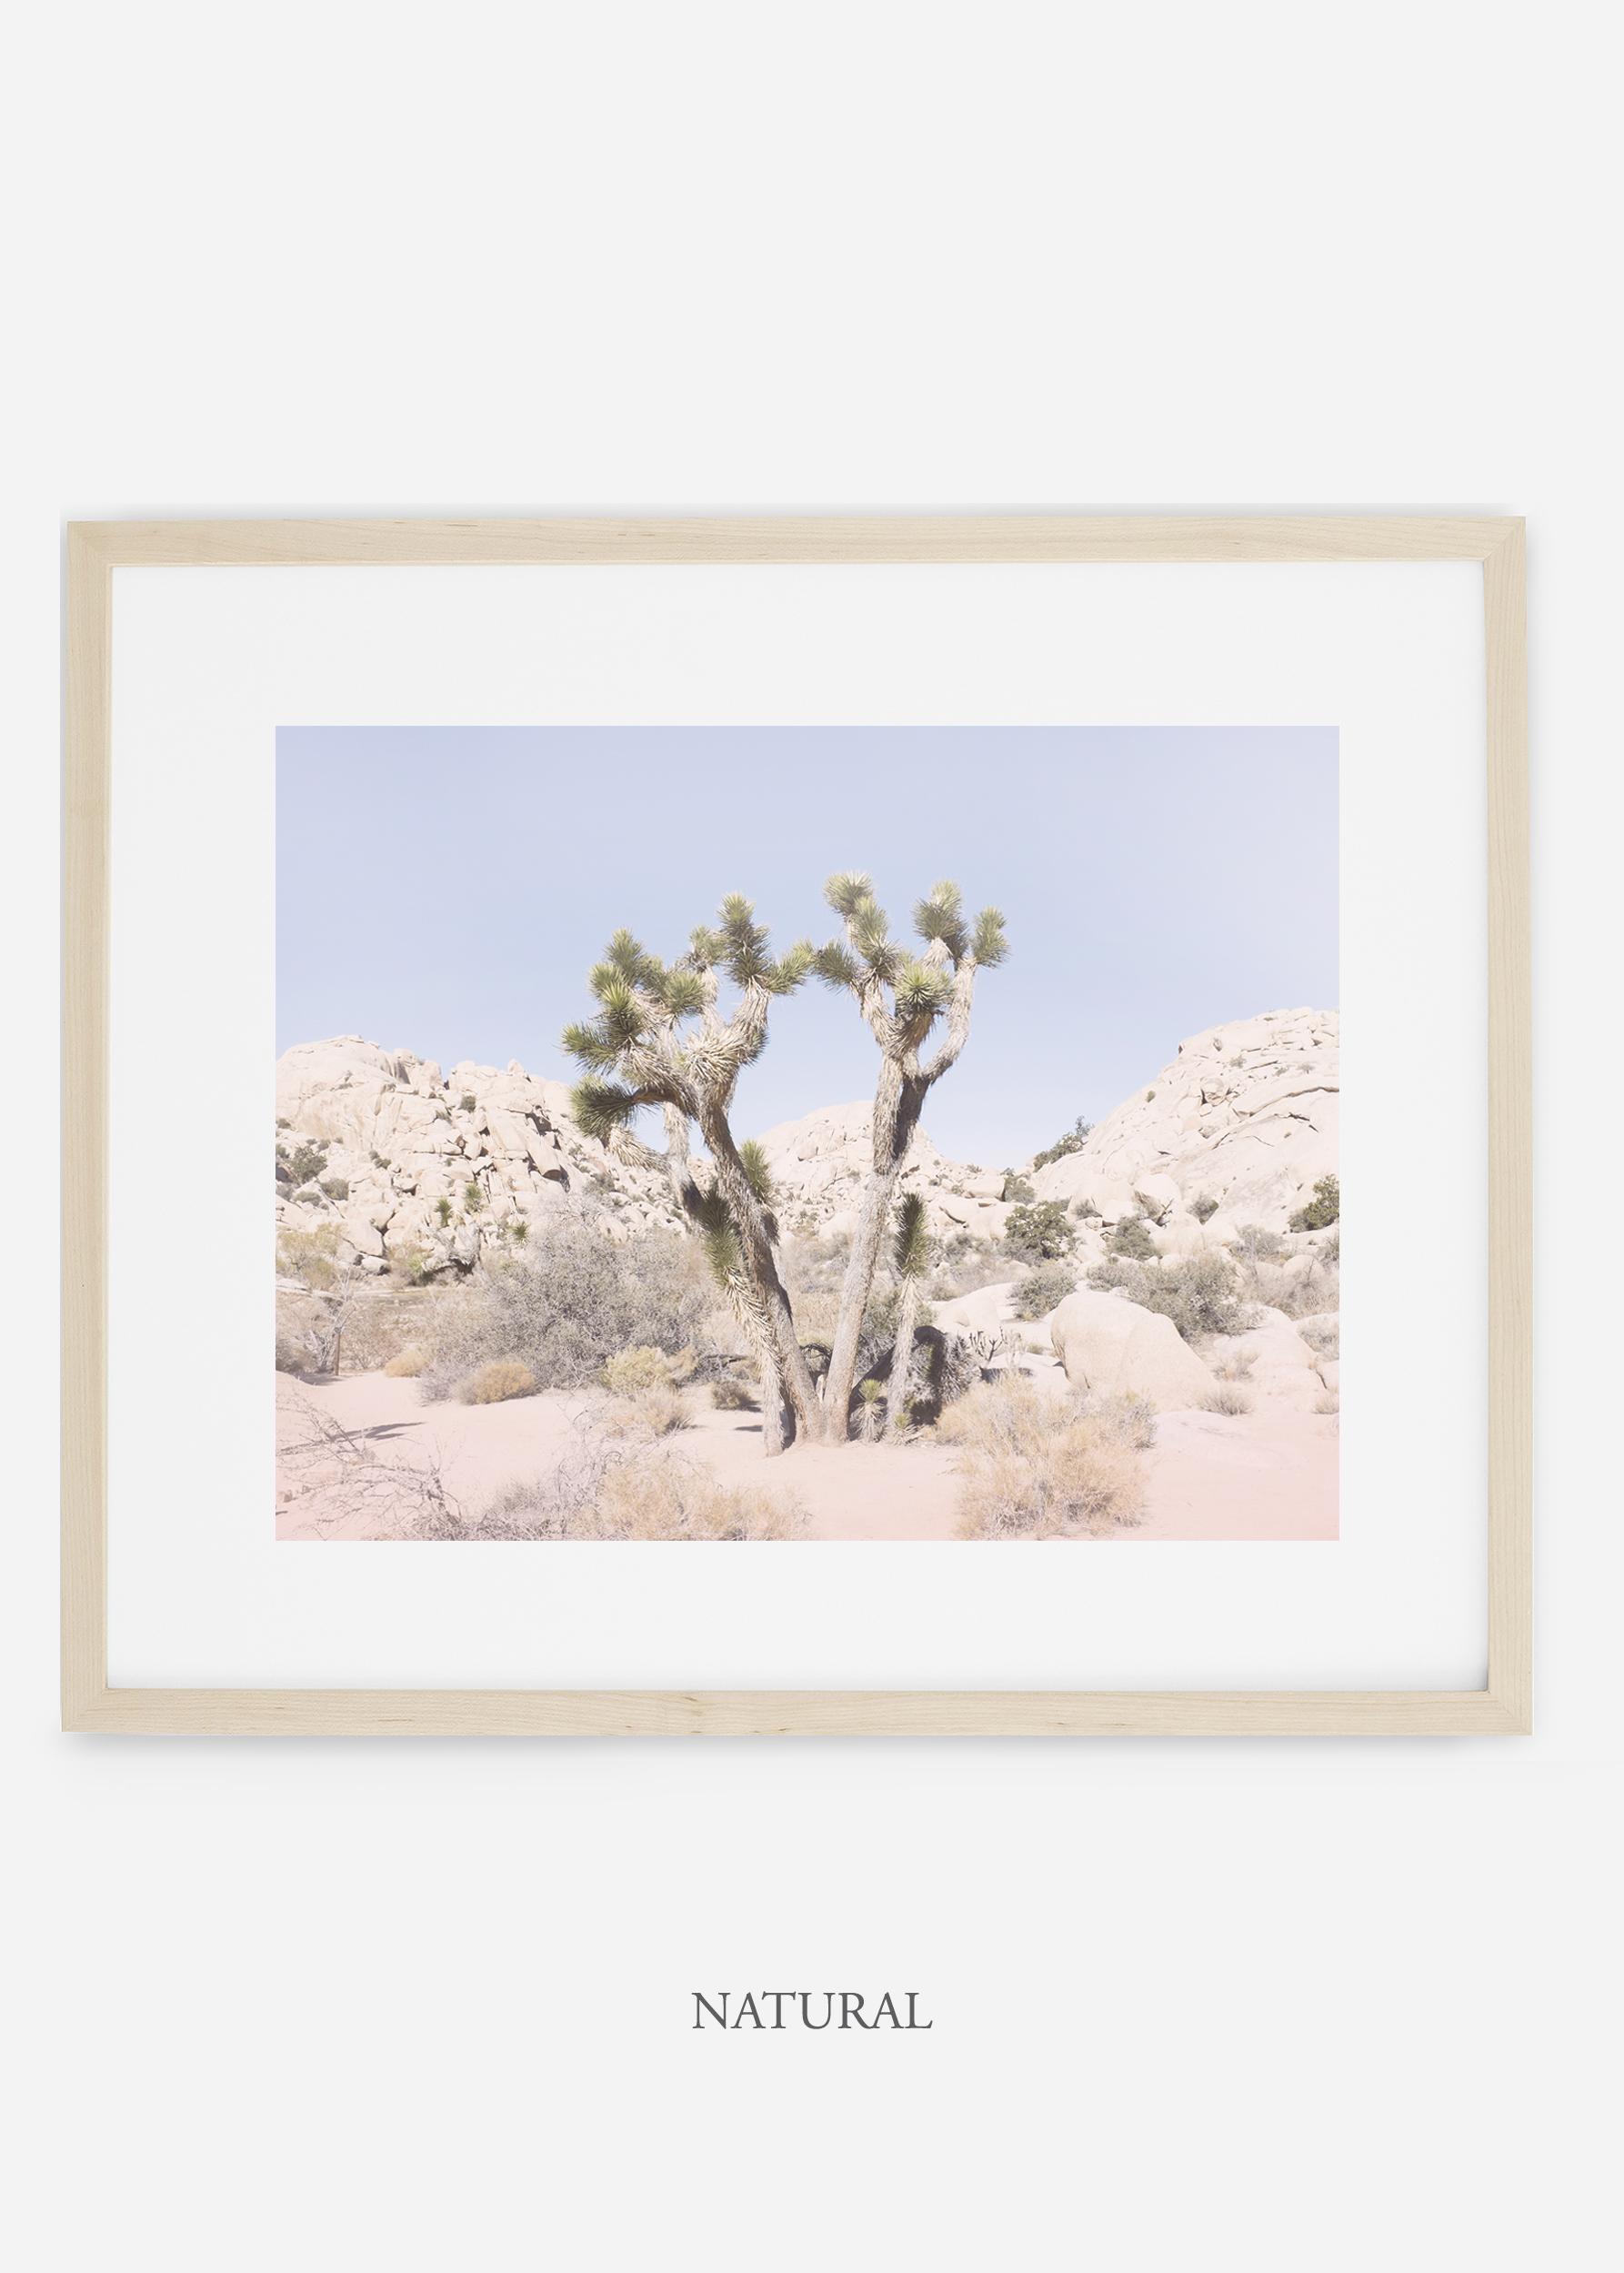 WilderCalifornia_natural_JoshuaTree_No.16_interiordesign_prints_art.jpg